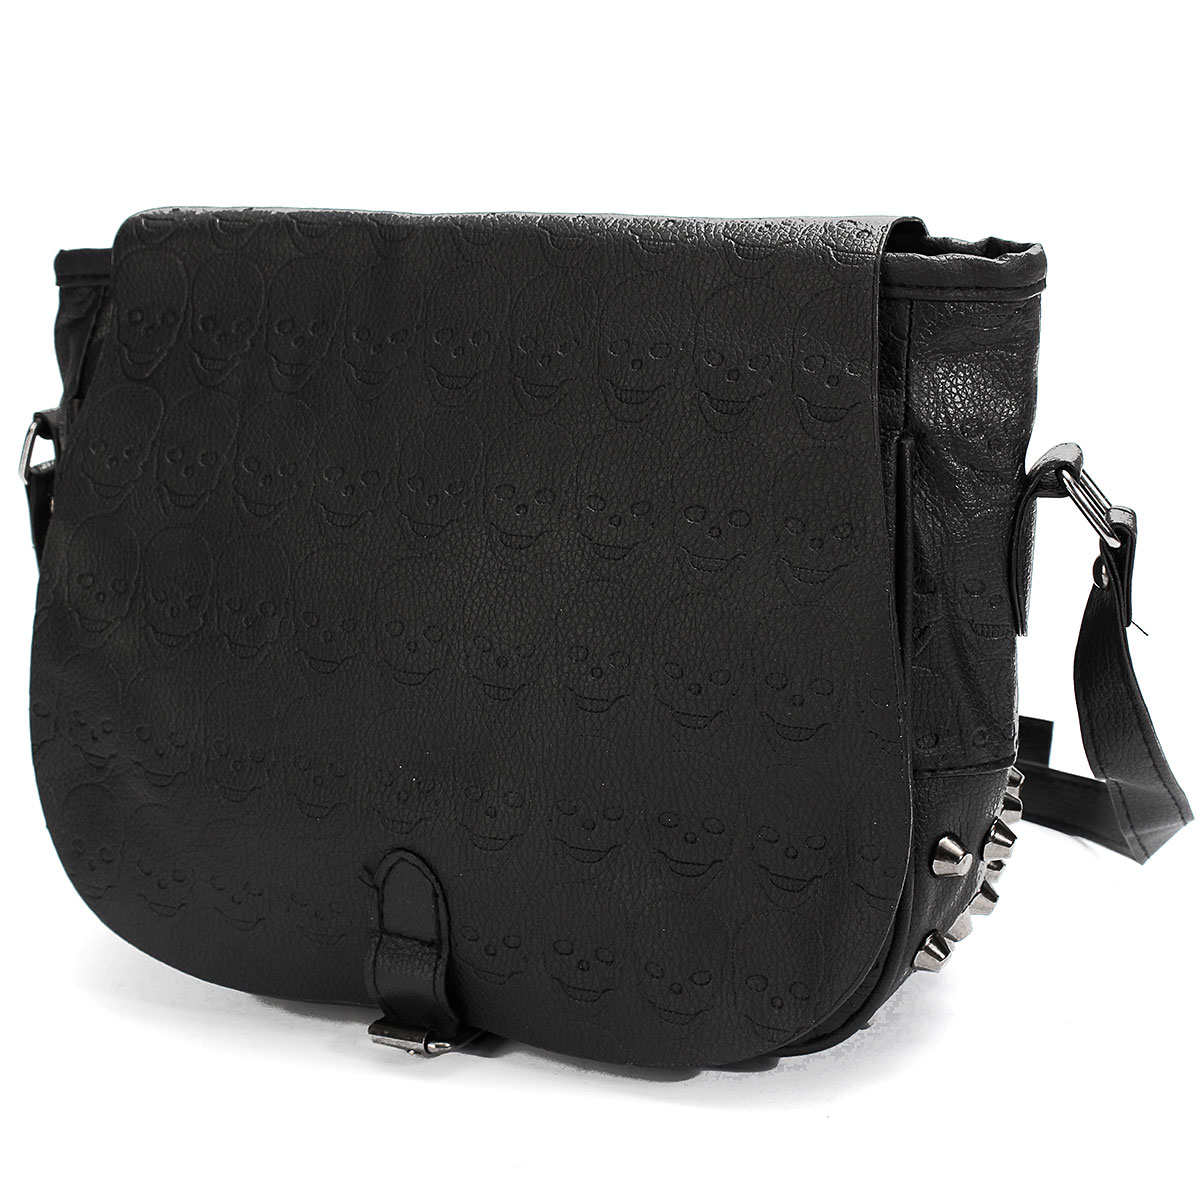 Black Women Shoulder Crossbody Bags Skull Leather Lady Handbags Retro Vintage Style Girls Small Messenger Sling Bag Rivet Bolsa(China (Mainland))